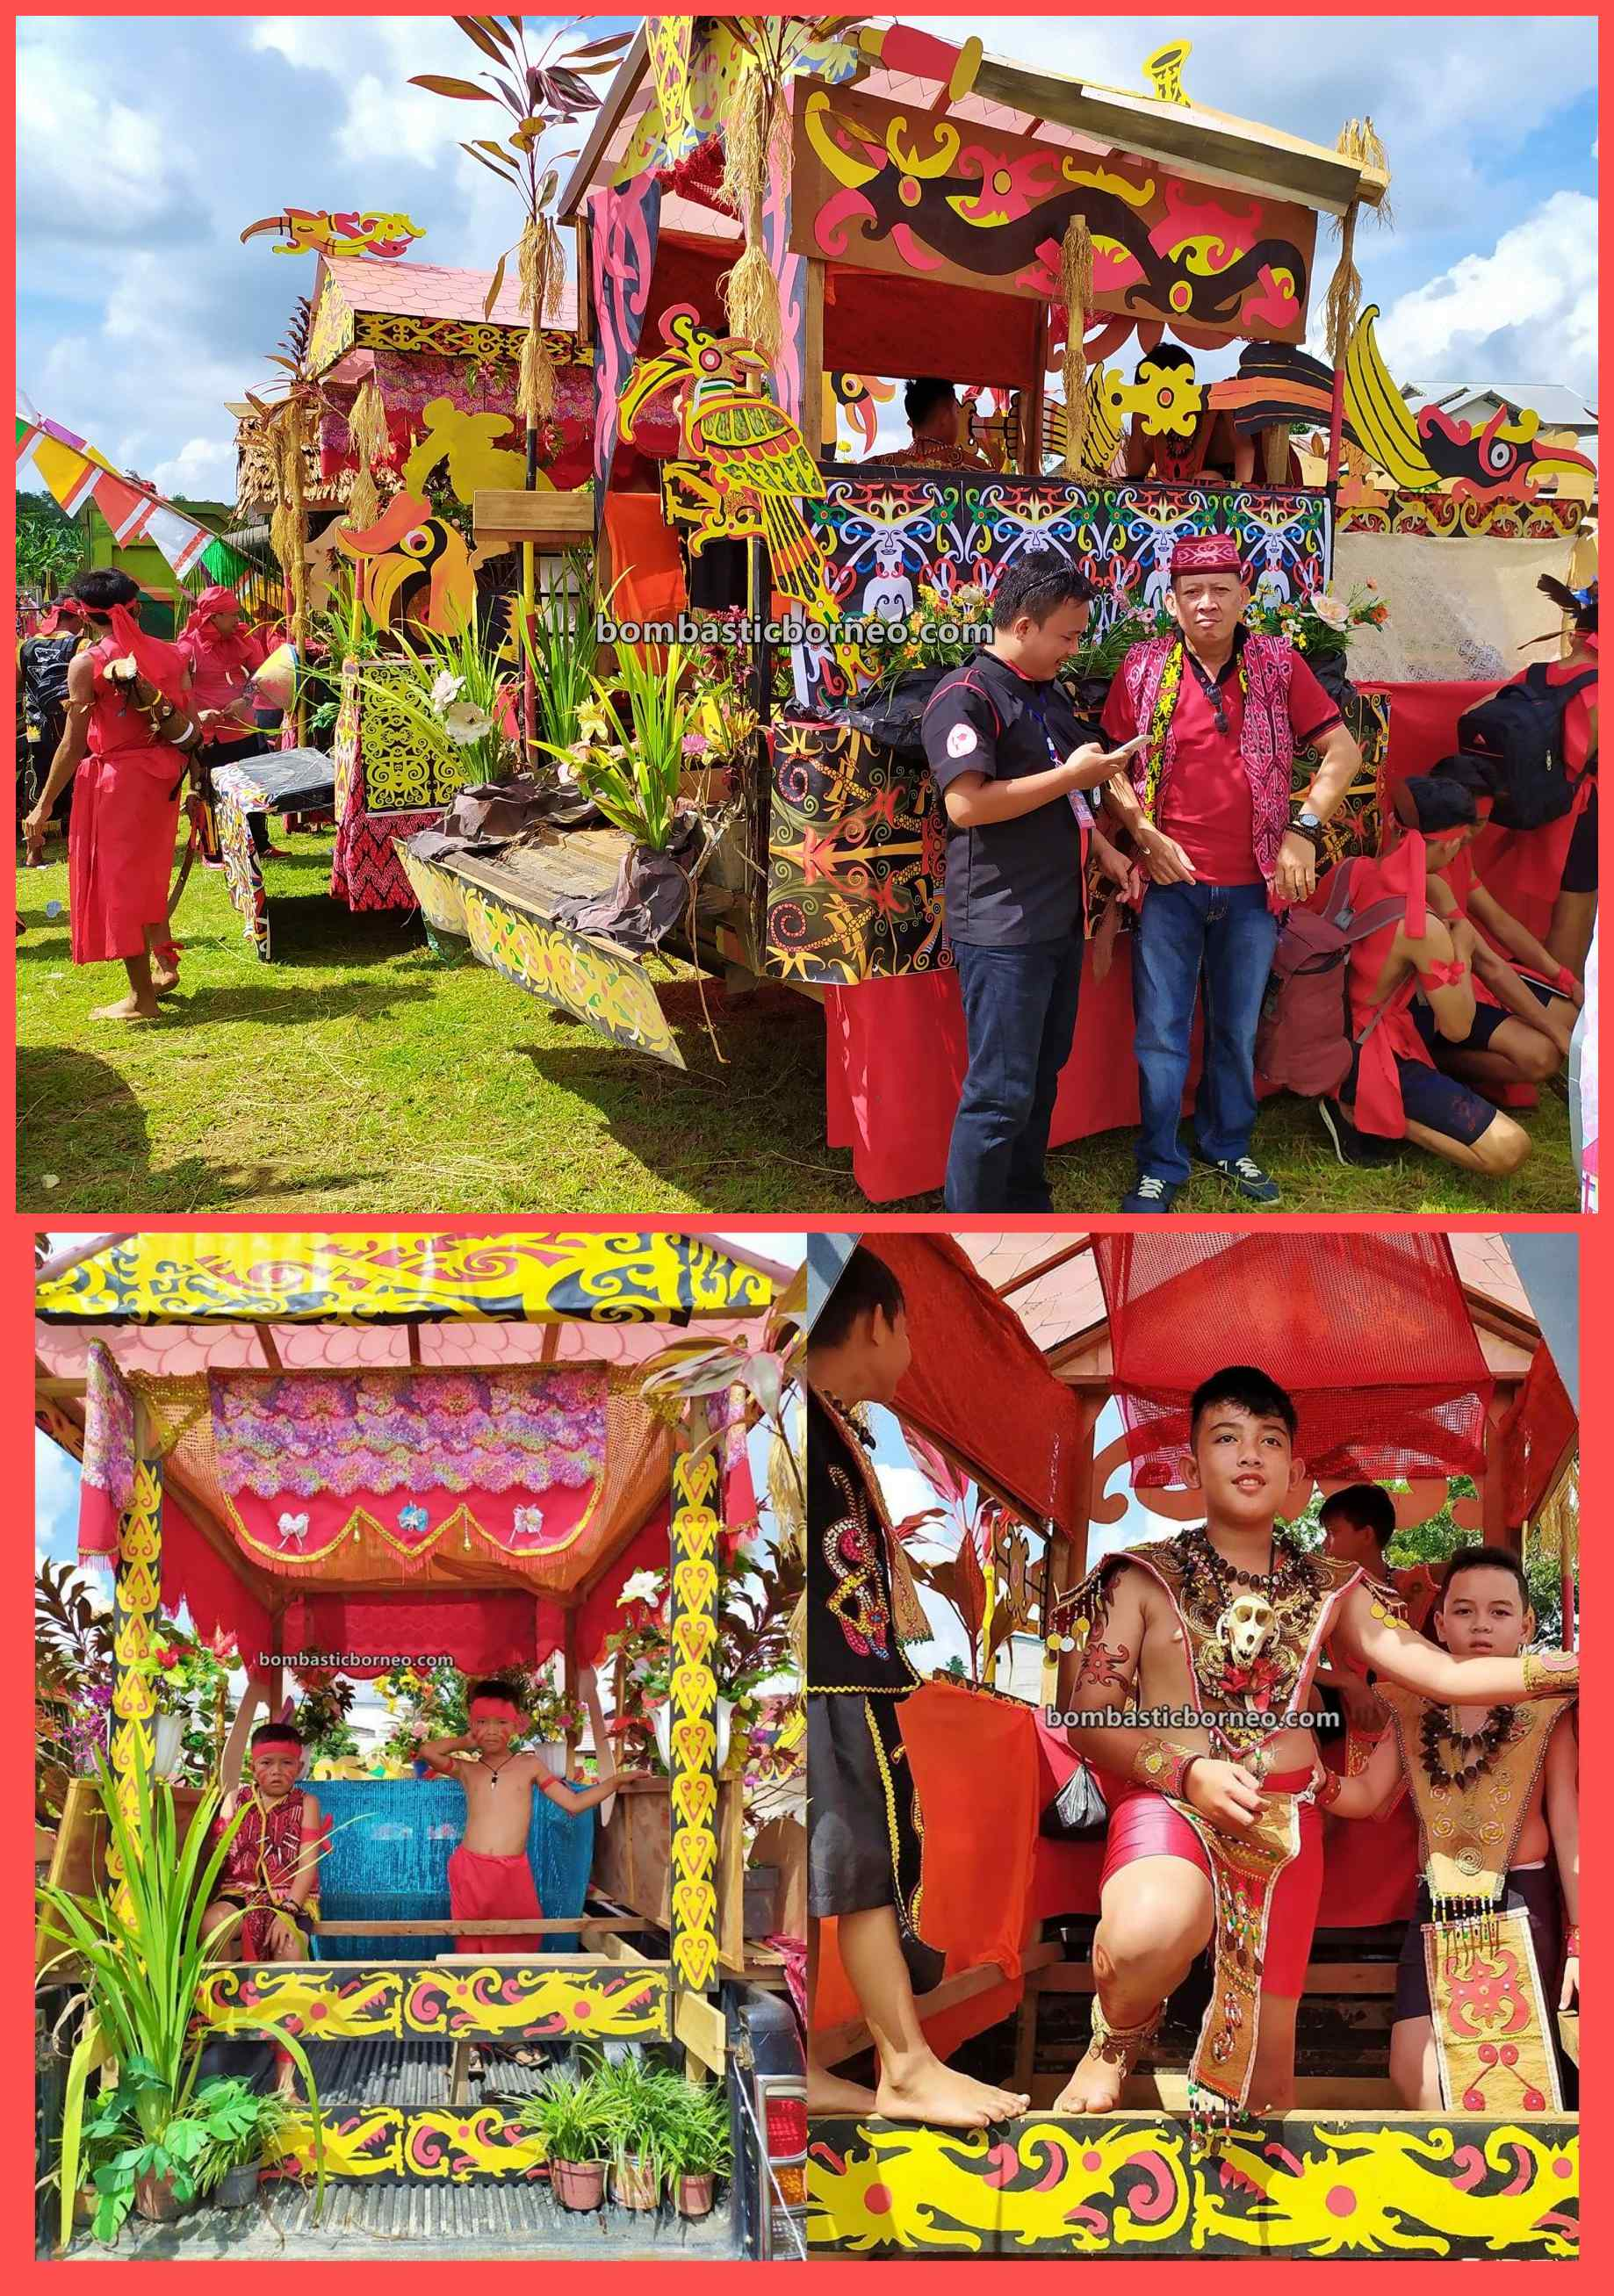 Festival Budaya Dayak, authentic, indigenous, culture, event, native, tribal, Indonesia, Kalimantan Barat, destination, Obyek wisata, Tourism, travel guide, Trans Border, Borneo